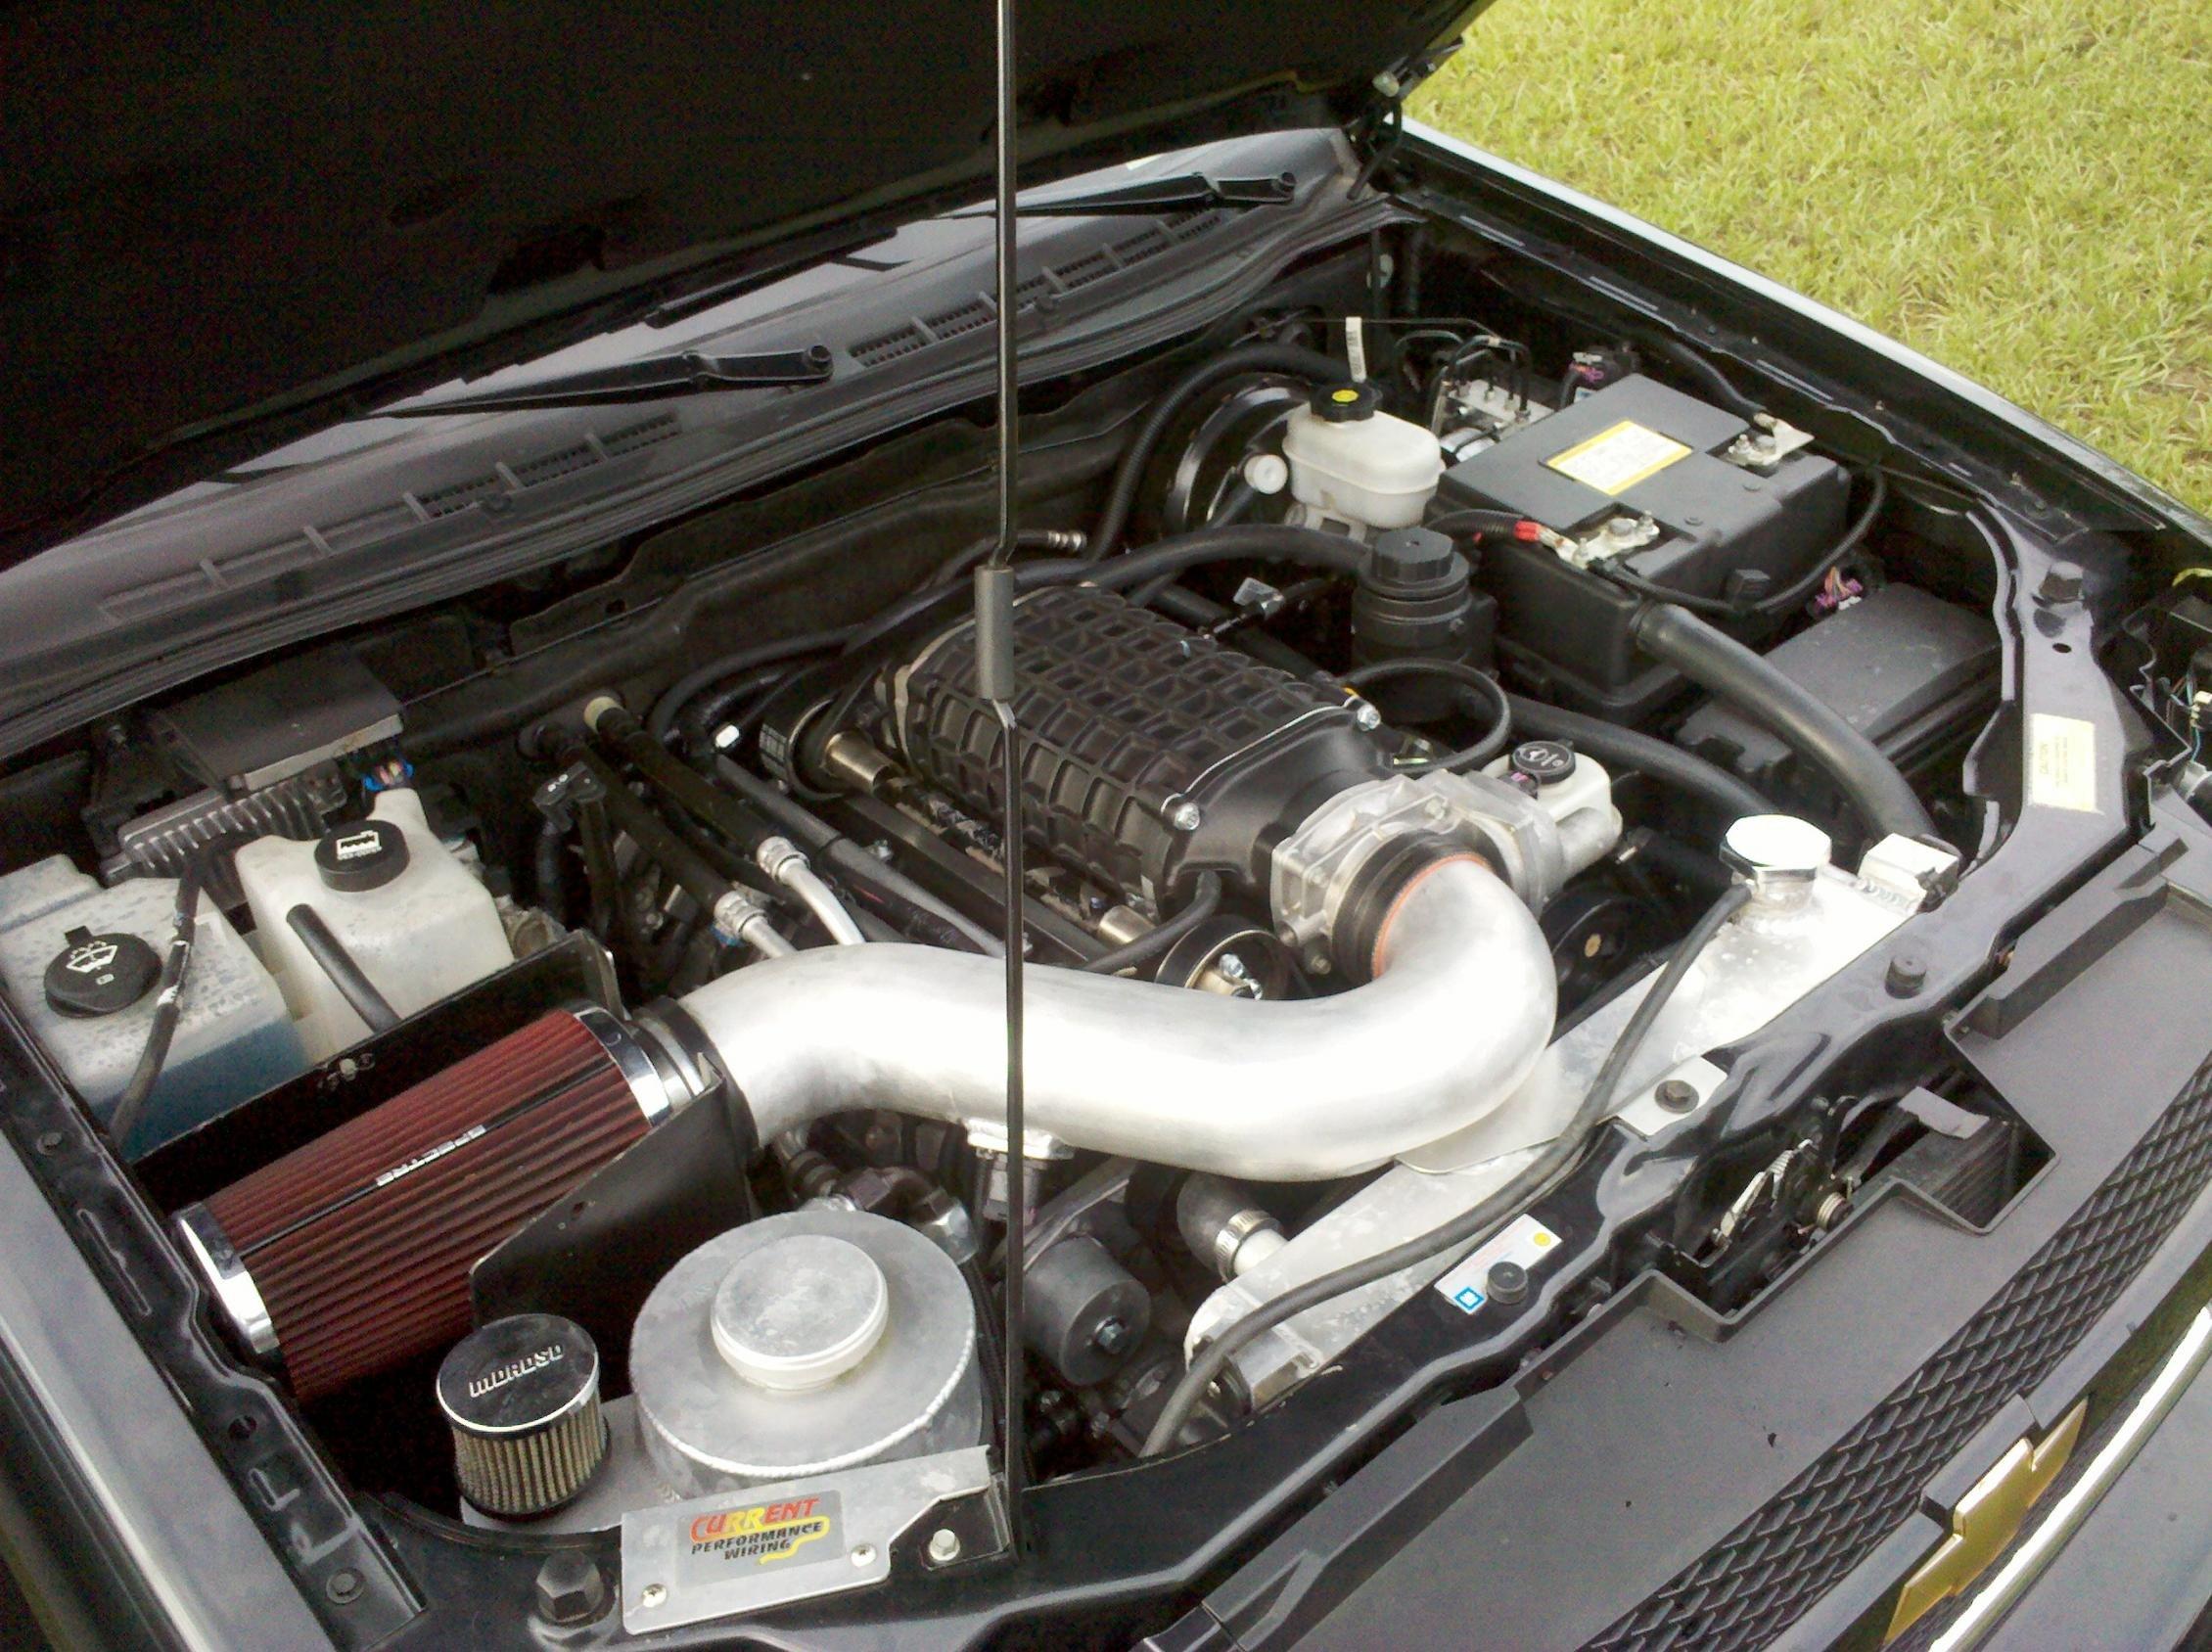 LS7 colorado, round 2. Blower and 6L80E - Page 8 - Chevrolet Colorado & GMC Canyon Forum